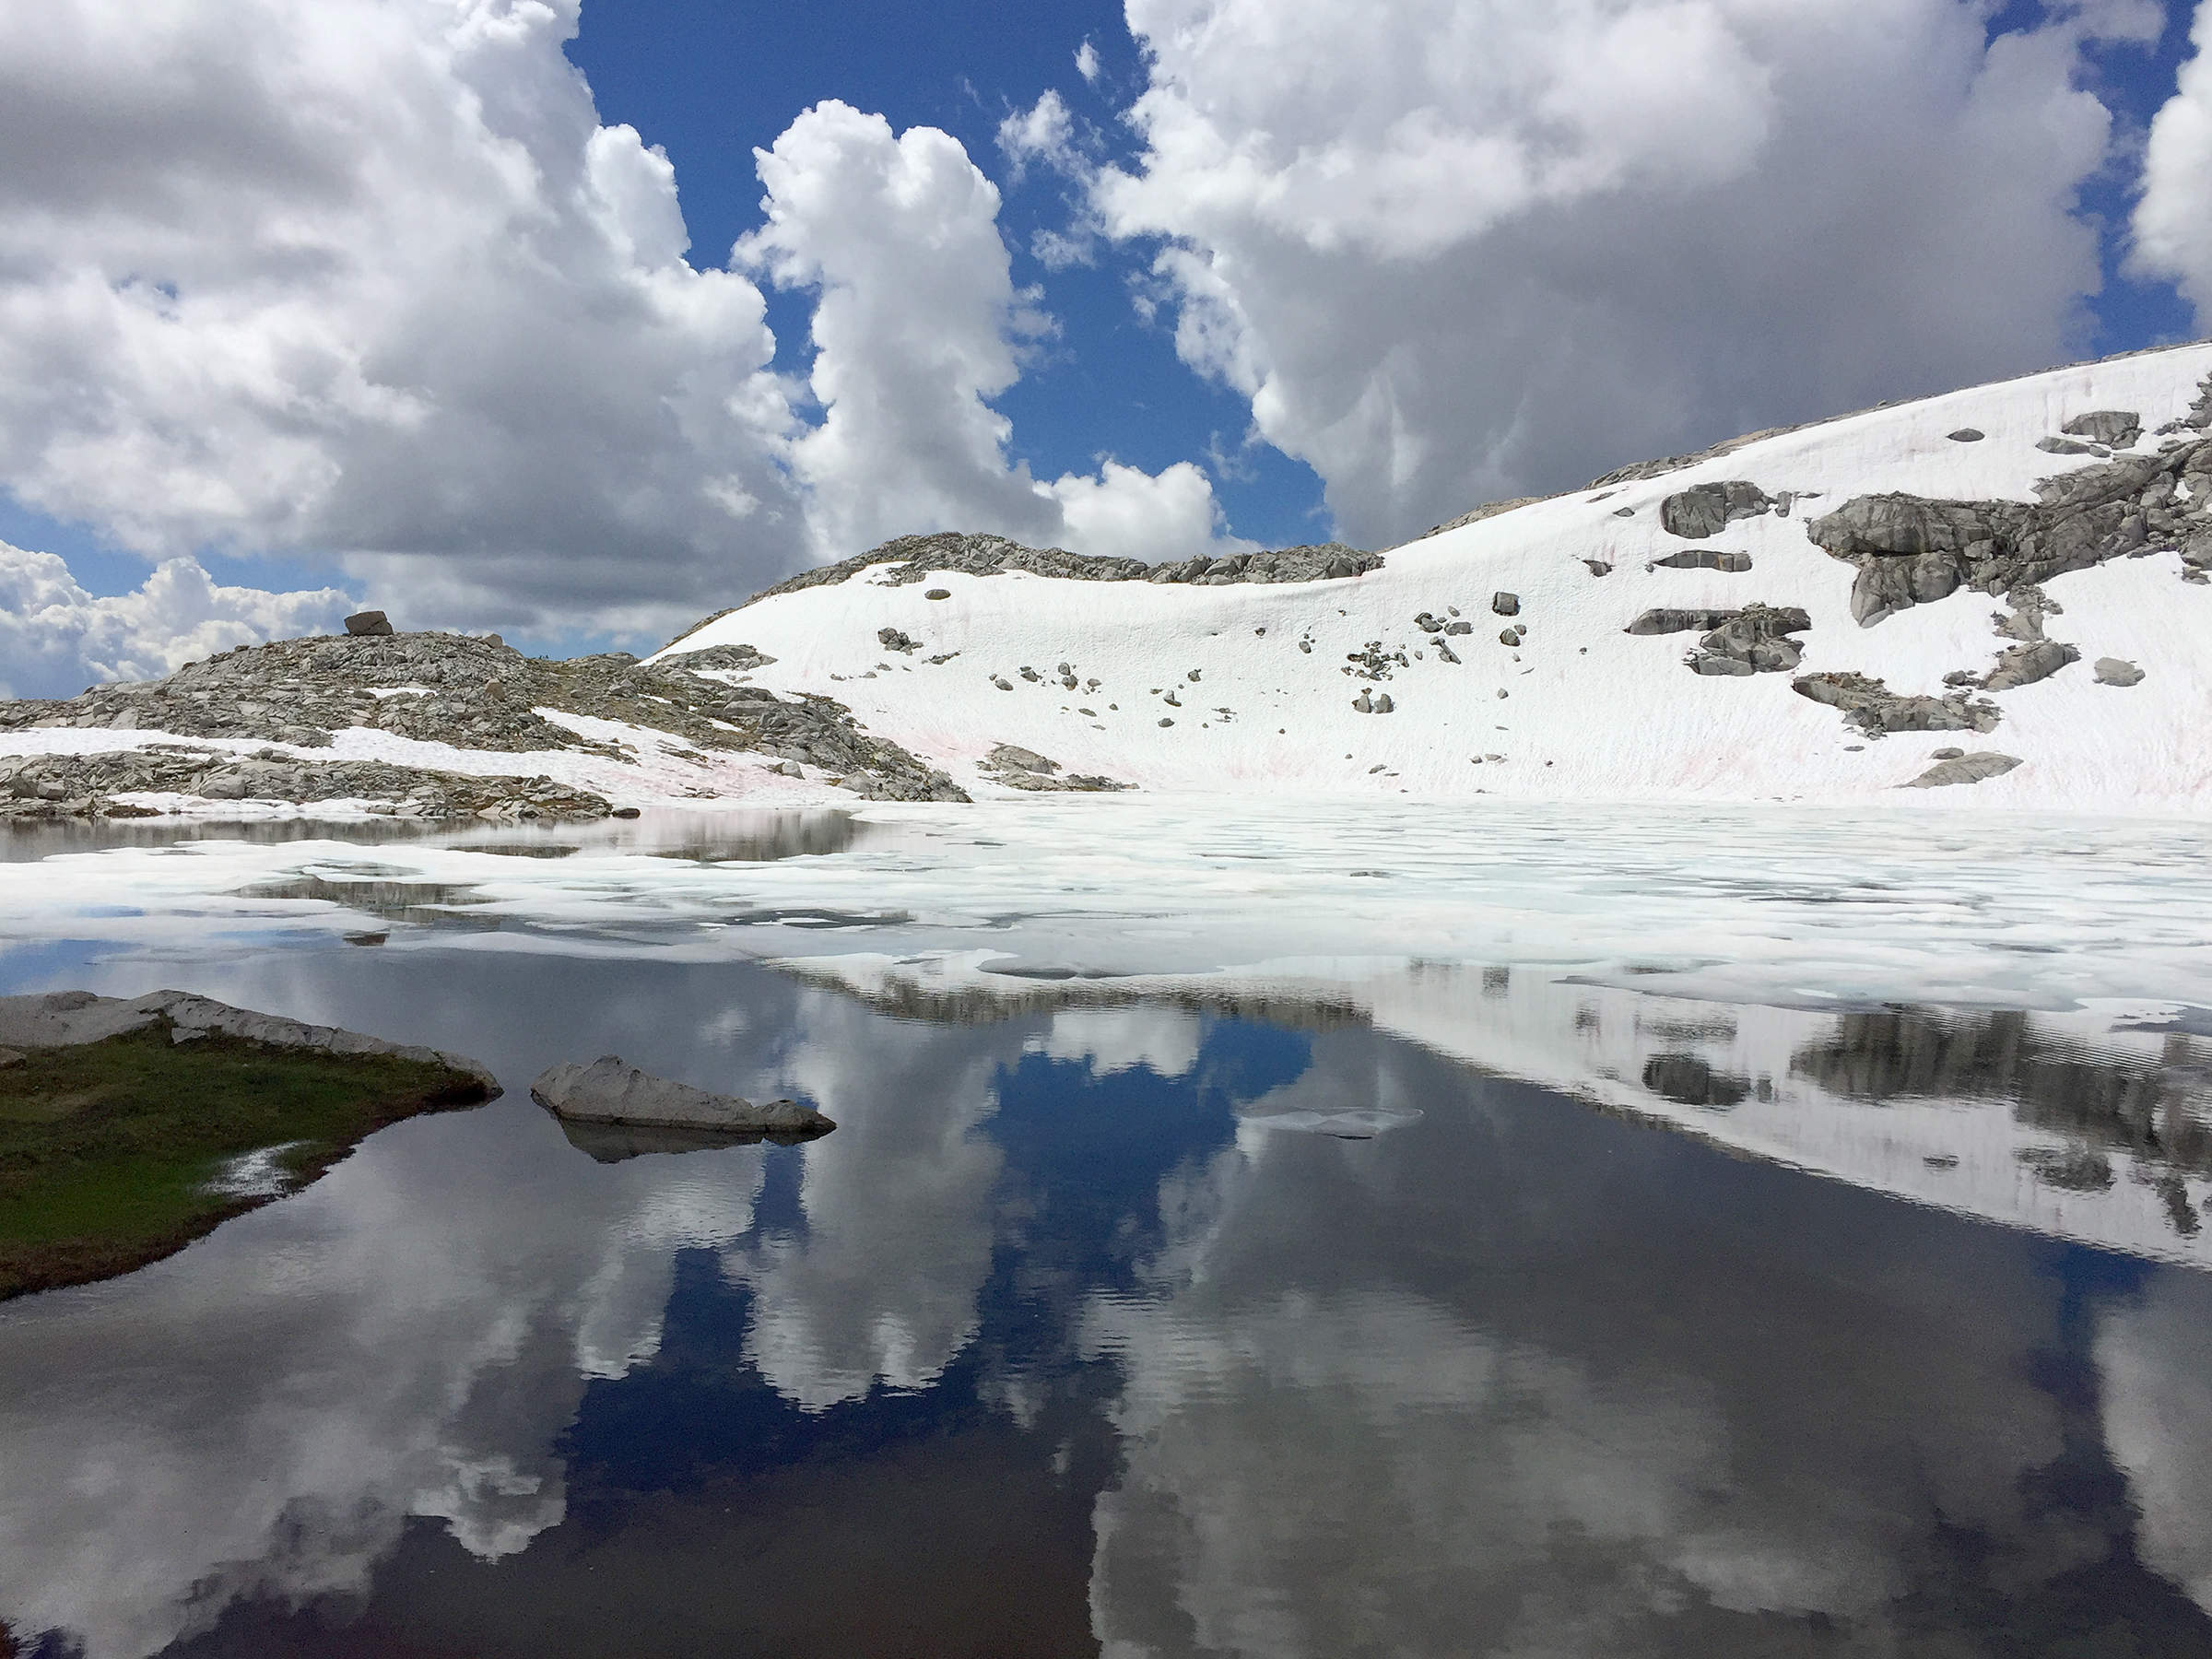 trailname-backstroketrailname-backstroke-sierra-high-route-2017_blue lake-_0169.jpg